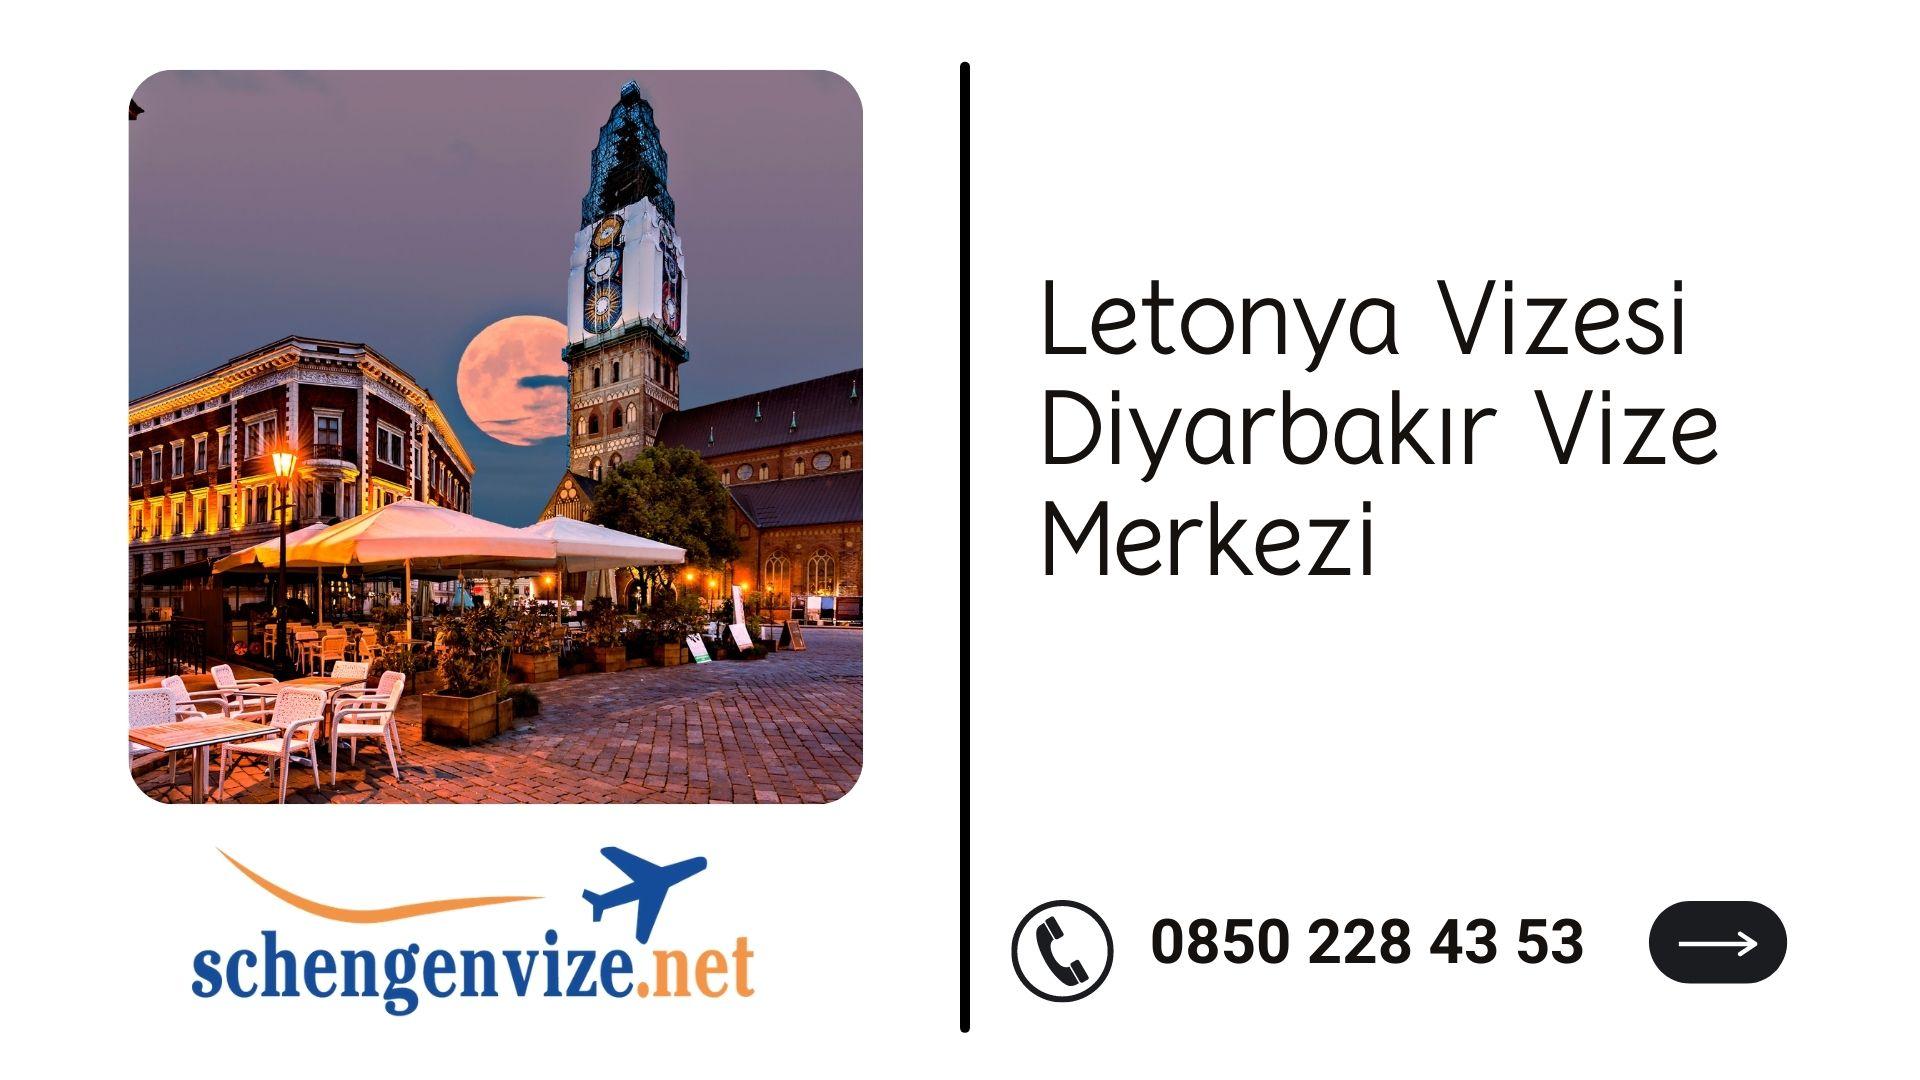 Letonya Vizesi Diyarbakır Vize Merkezi